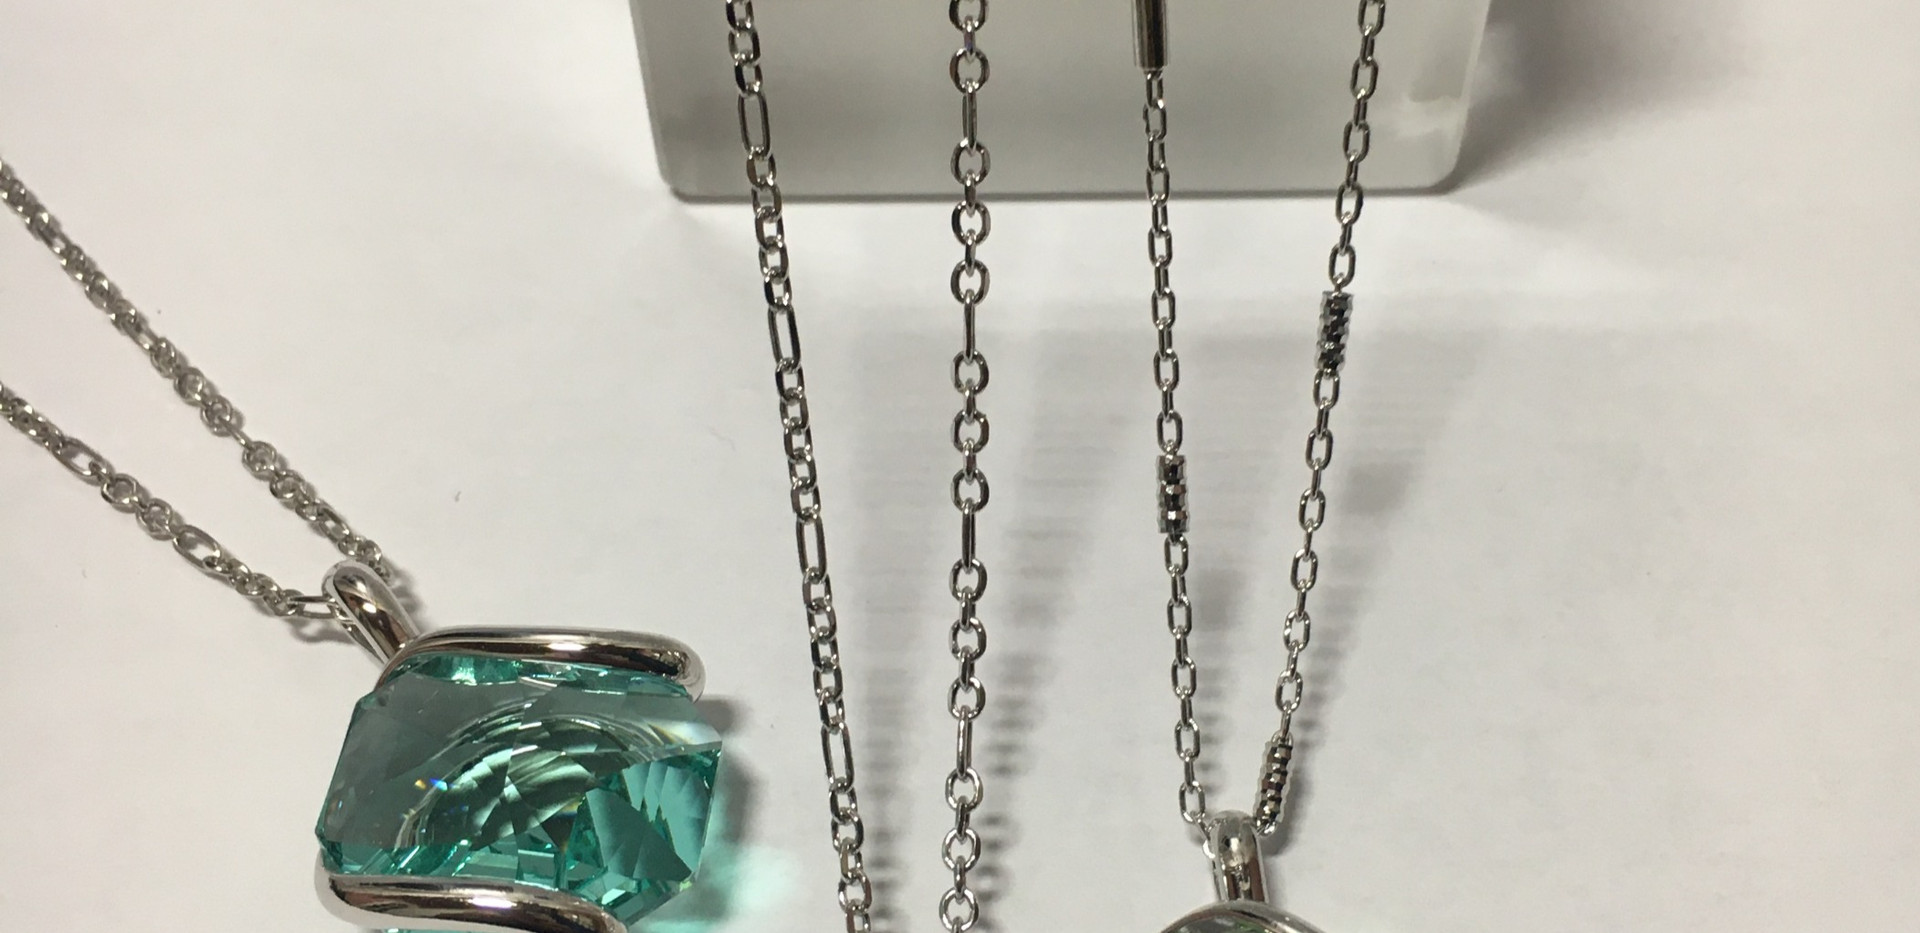 Colliers assortis, chaine et pendentif. 70€-80€